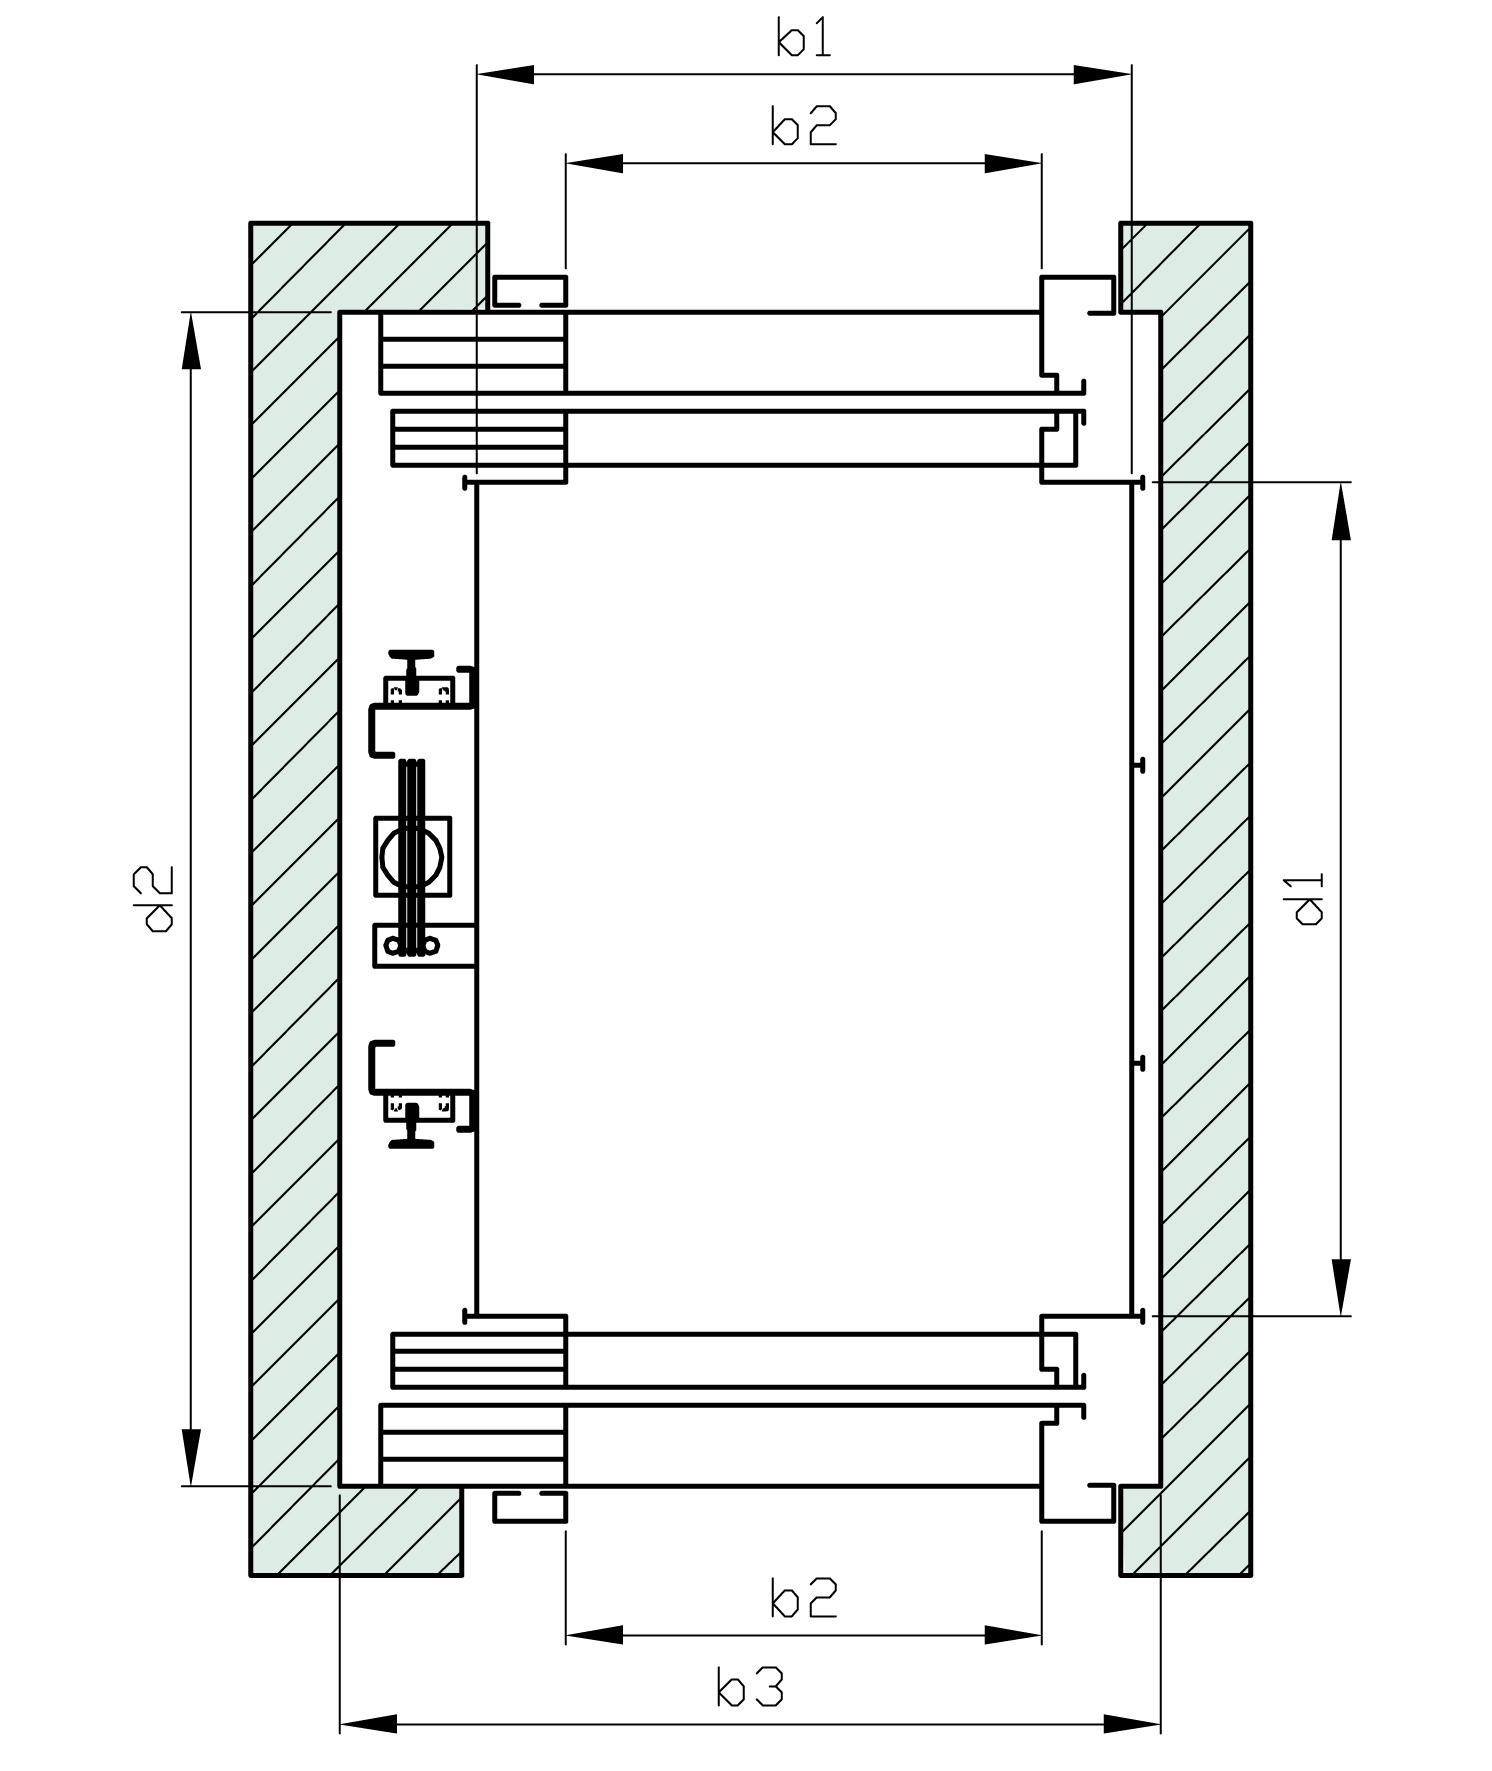 Home elevator dimensions -  Home Elevator Dimensions